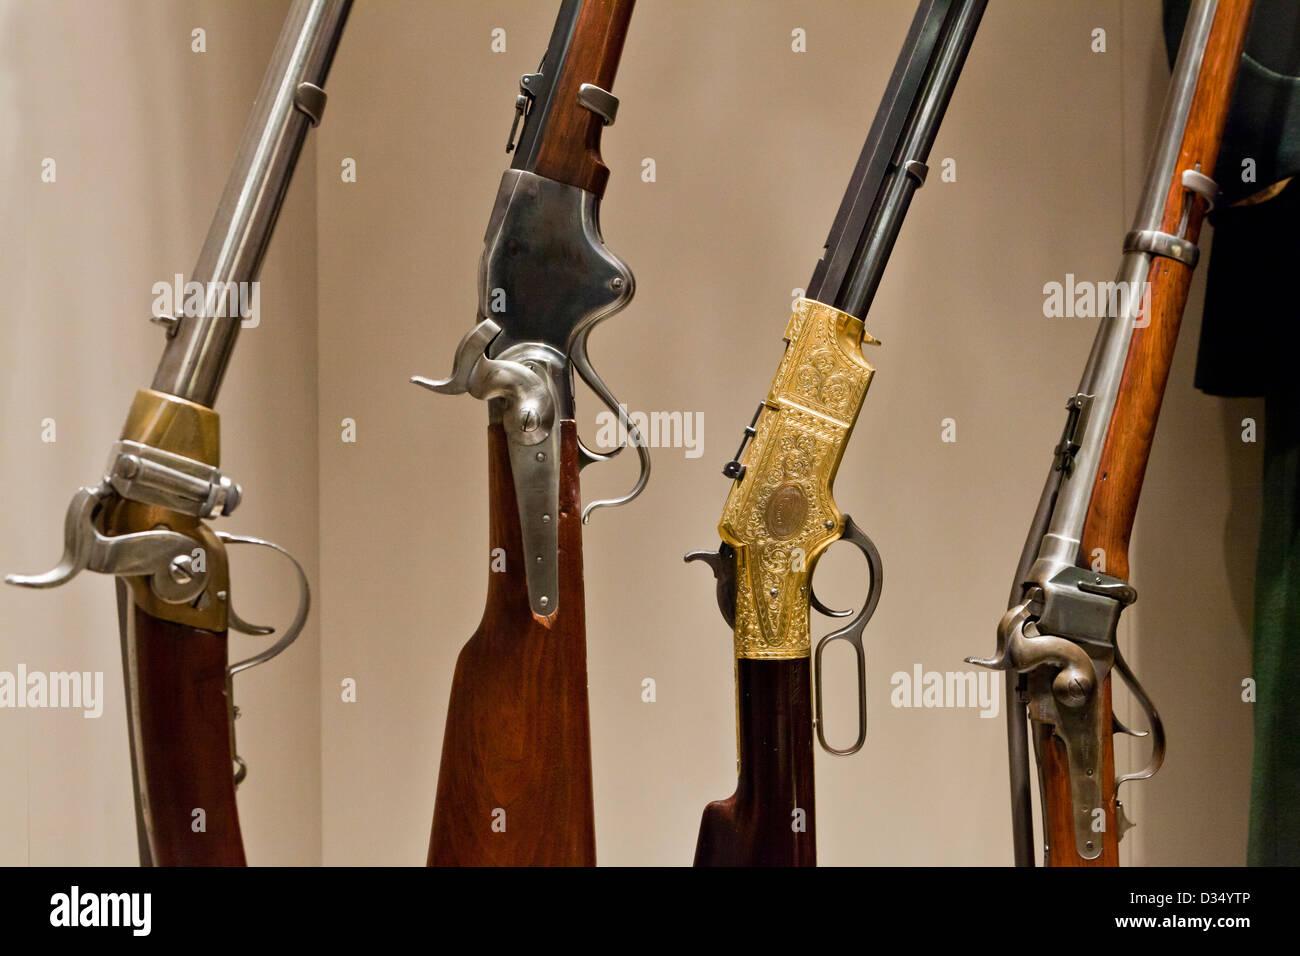 Amerikanischer Bürgerkrieg Waffen